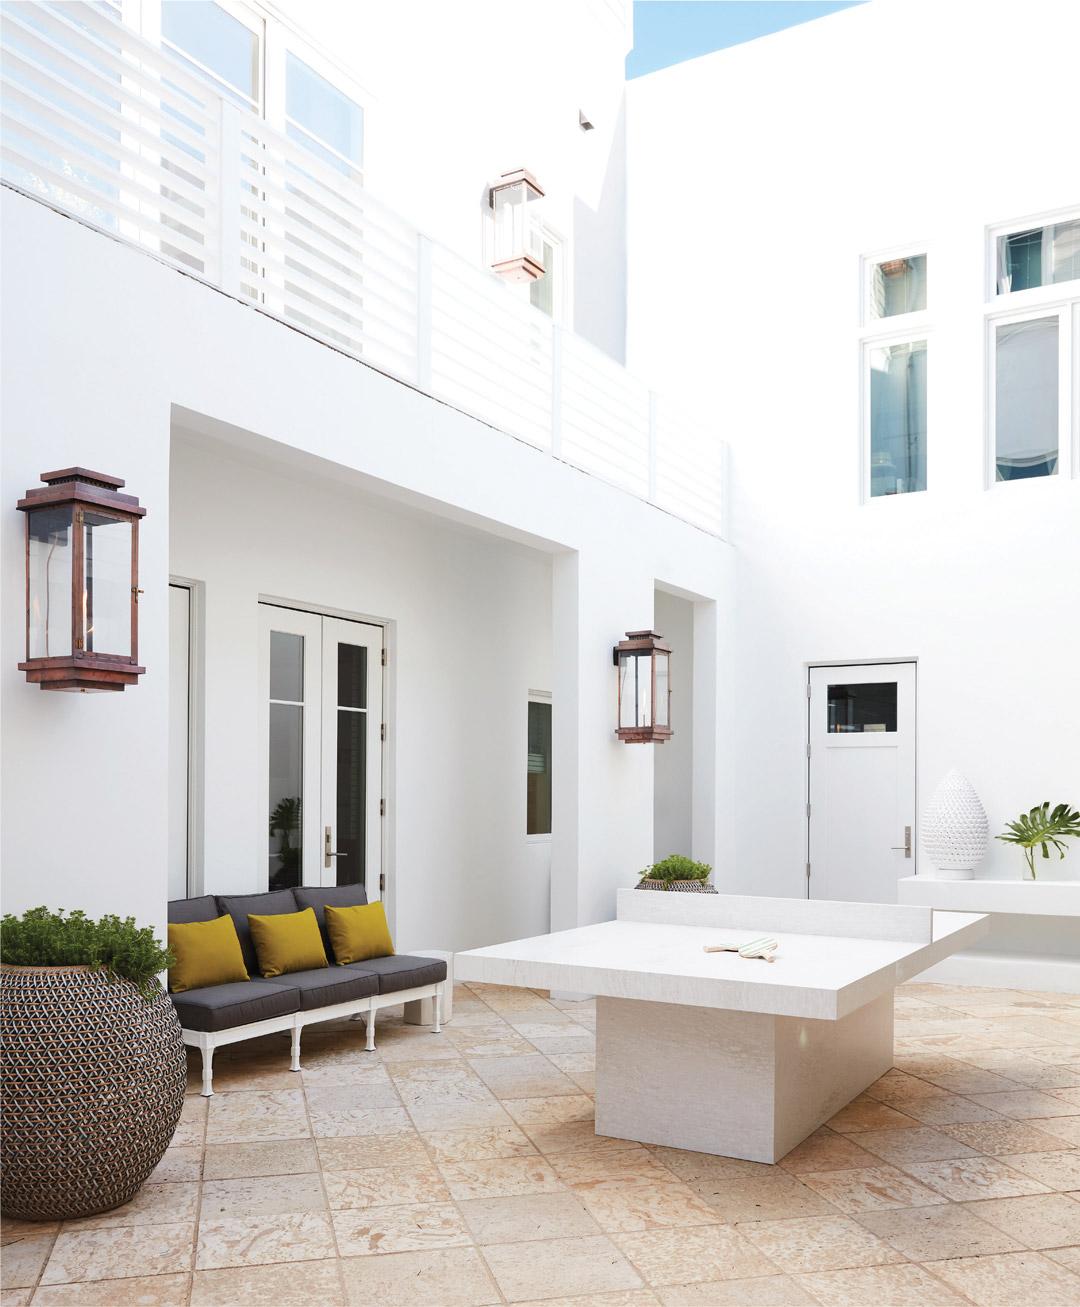 Designer Vern Yip S Georgia Home: This Courtyard In Vern Yip's Rosemary Beach Vacation House